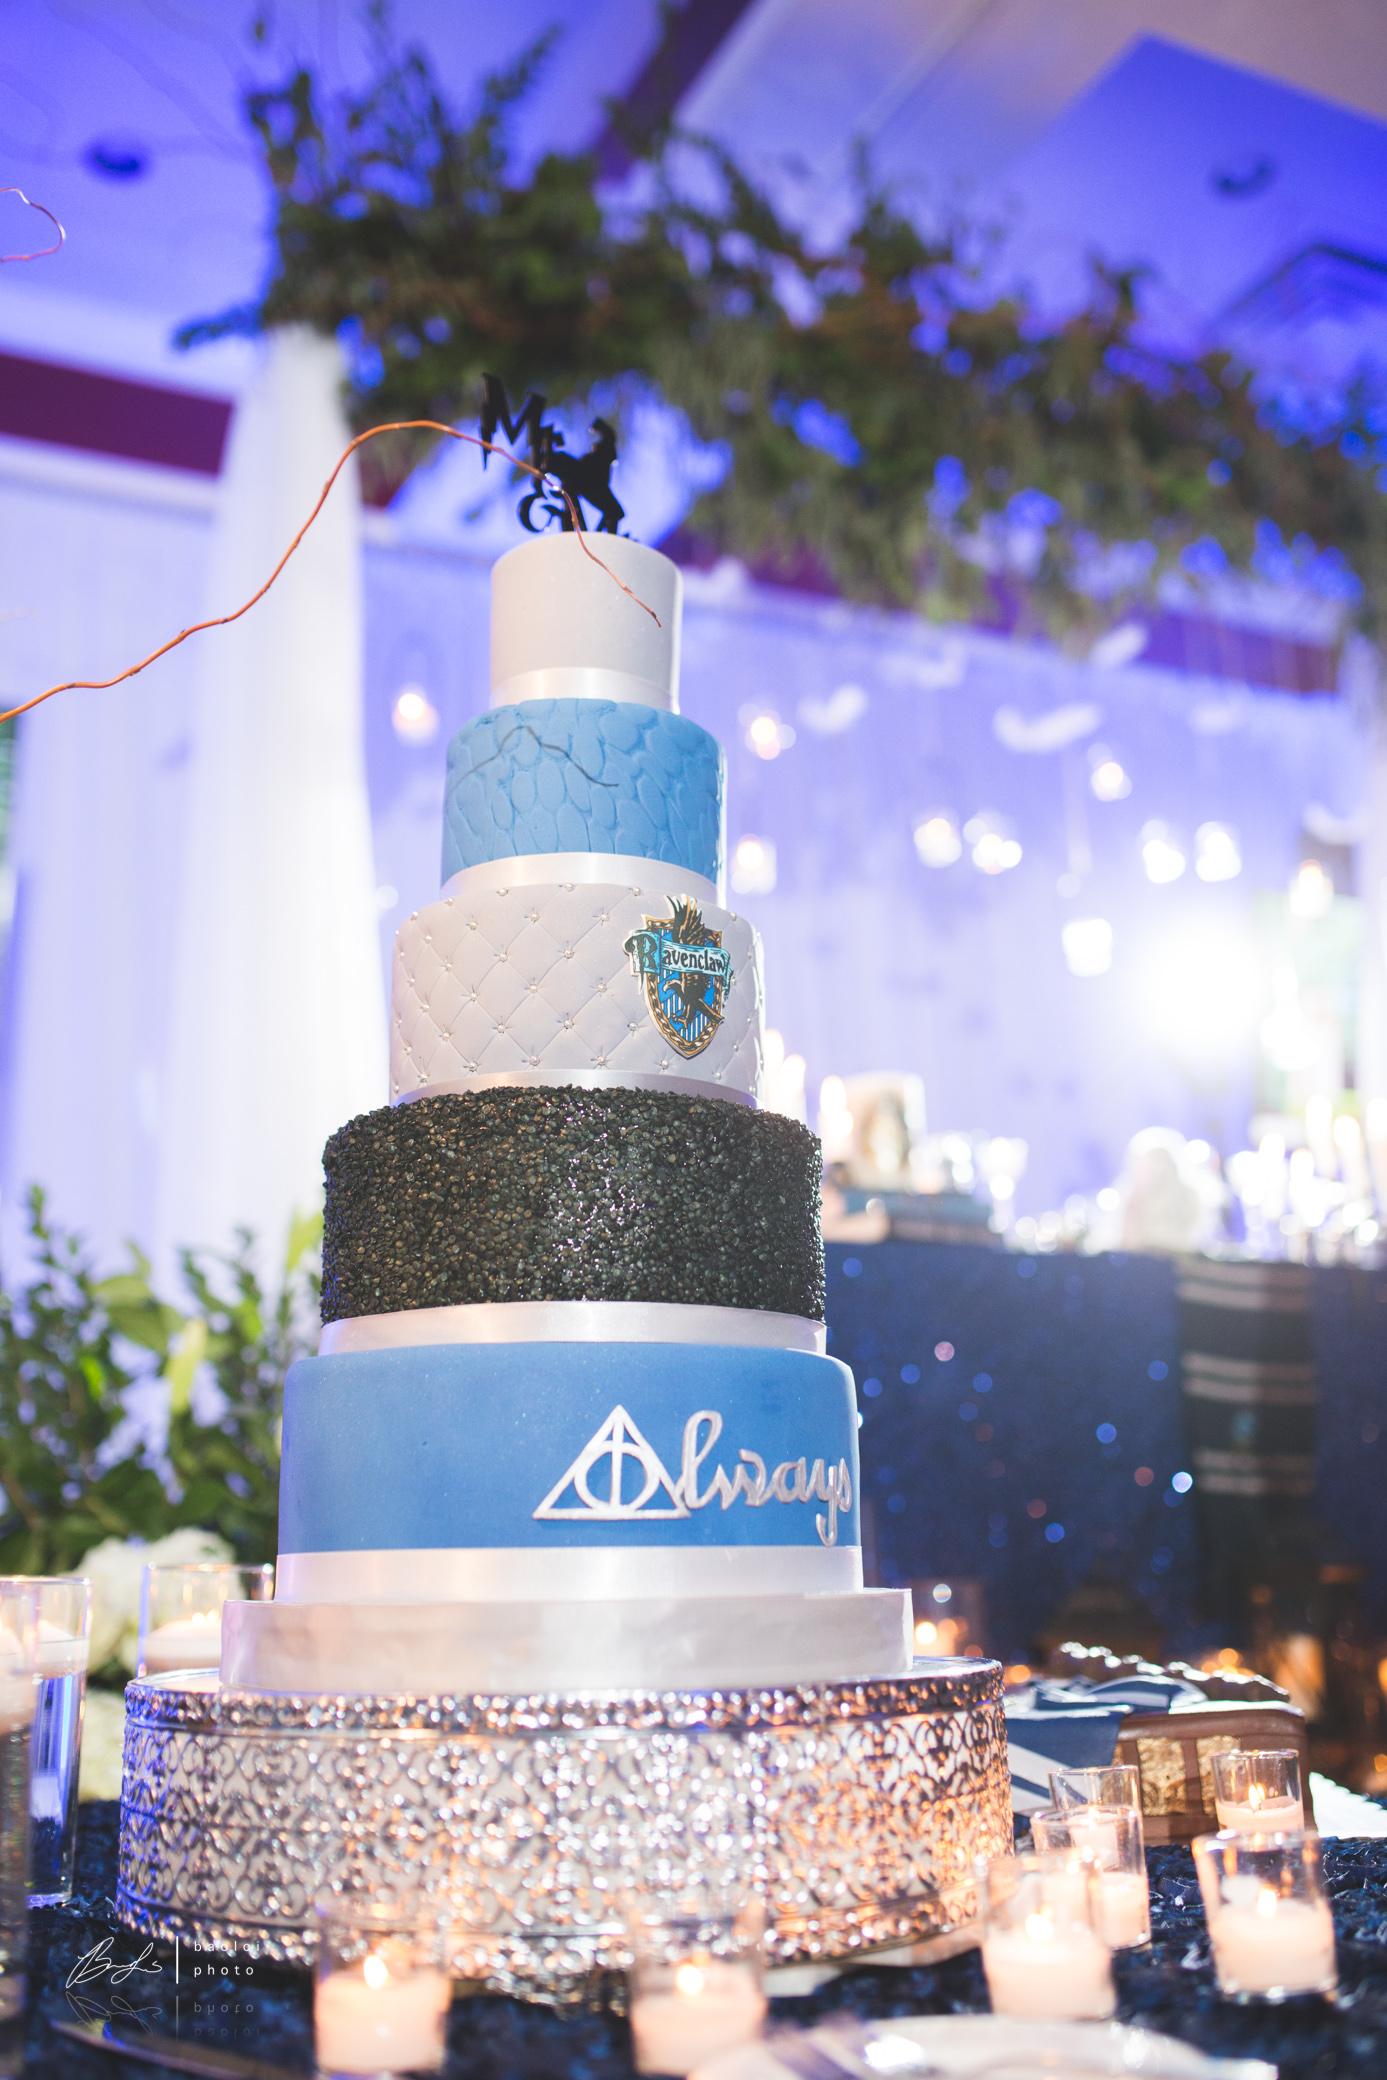 Harry Potter Wedding Cake Design